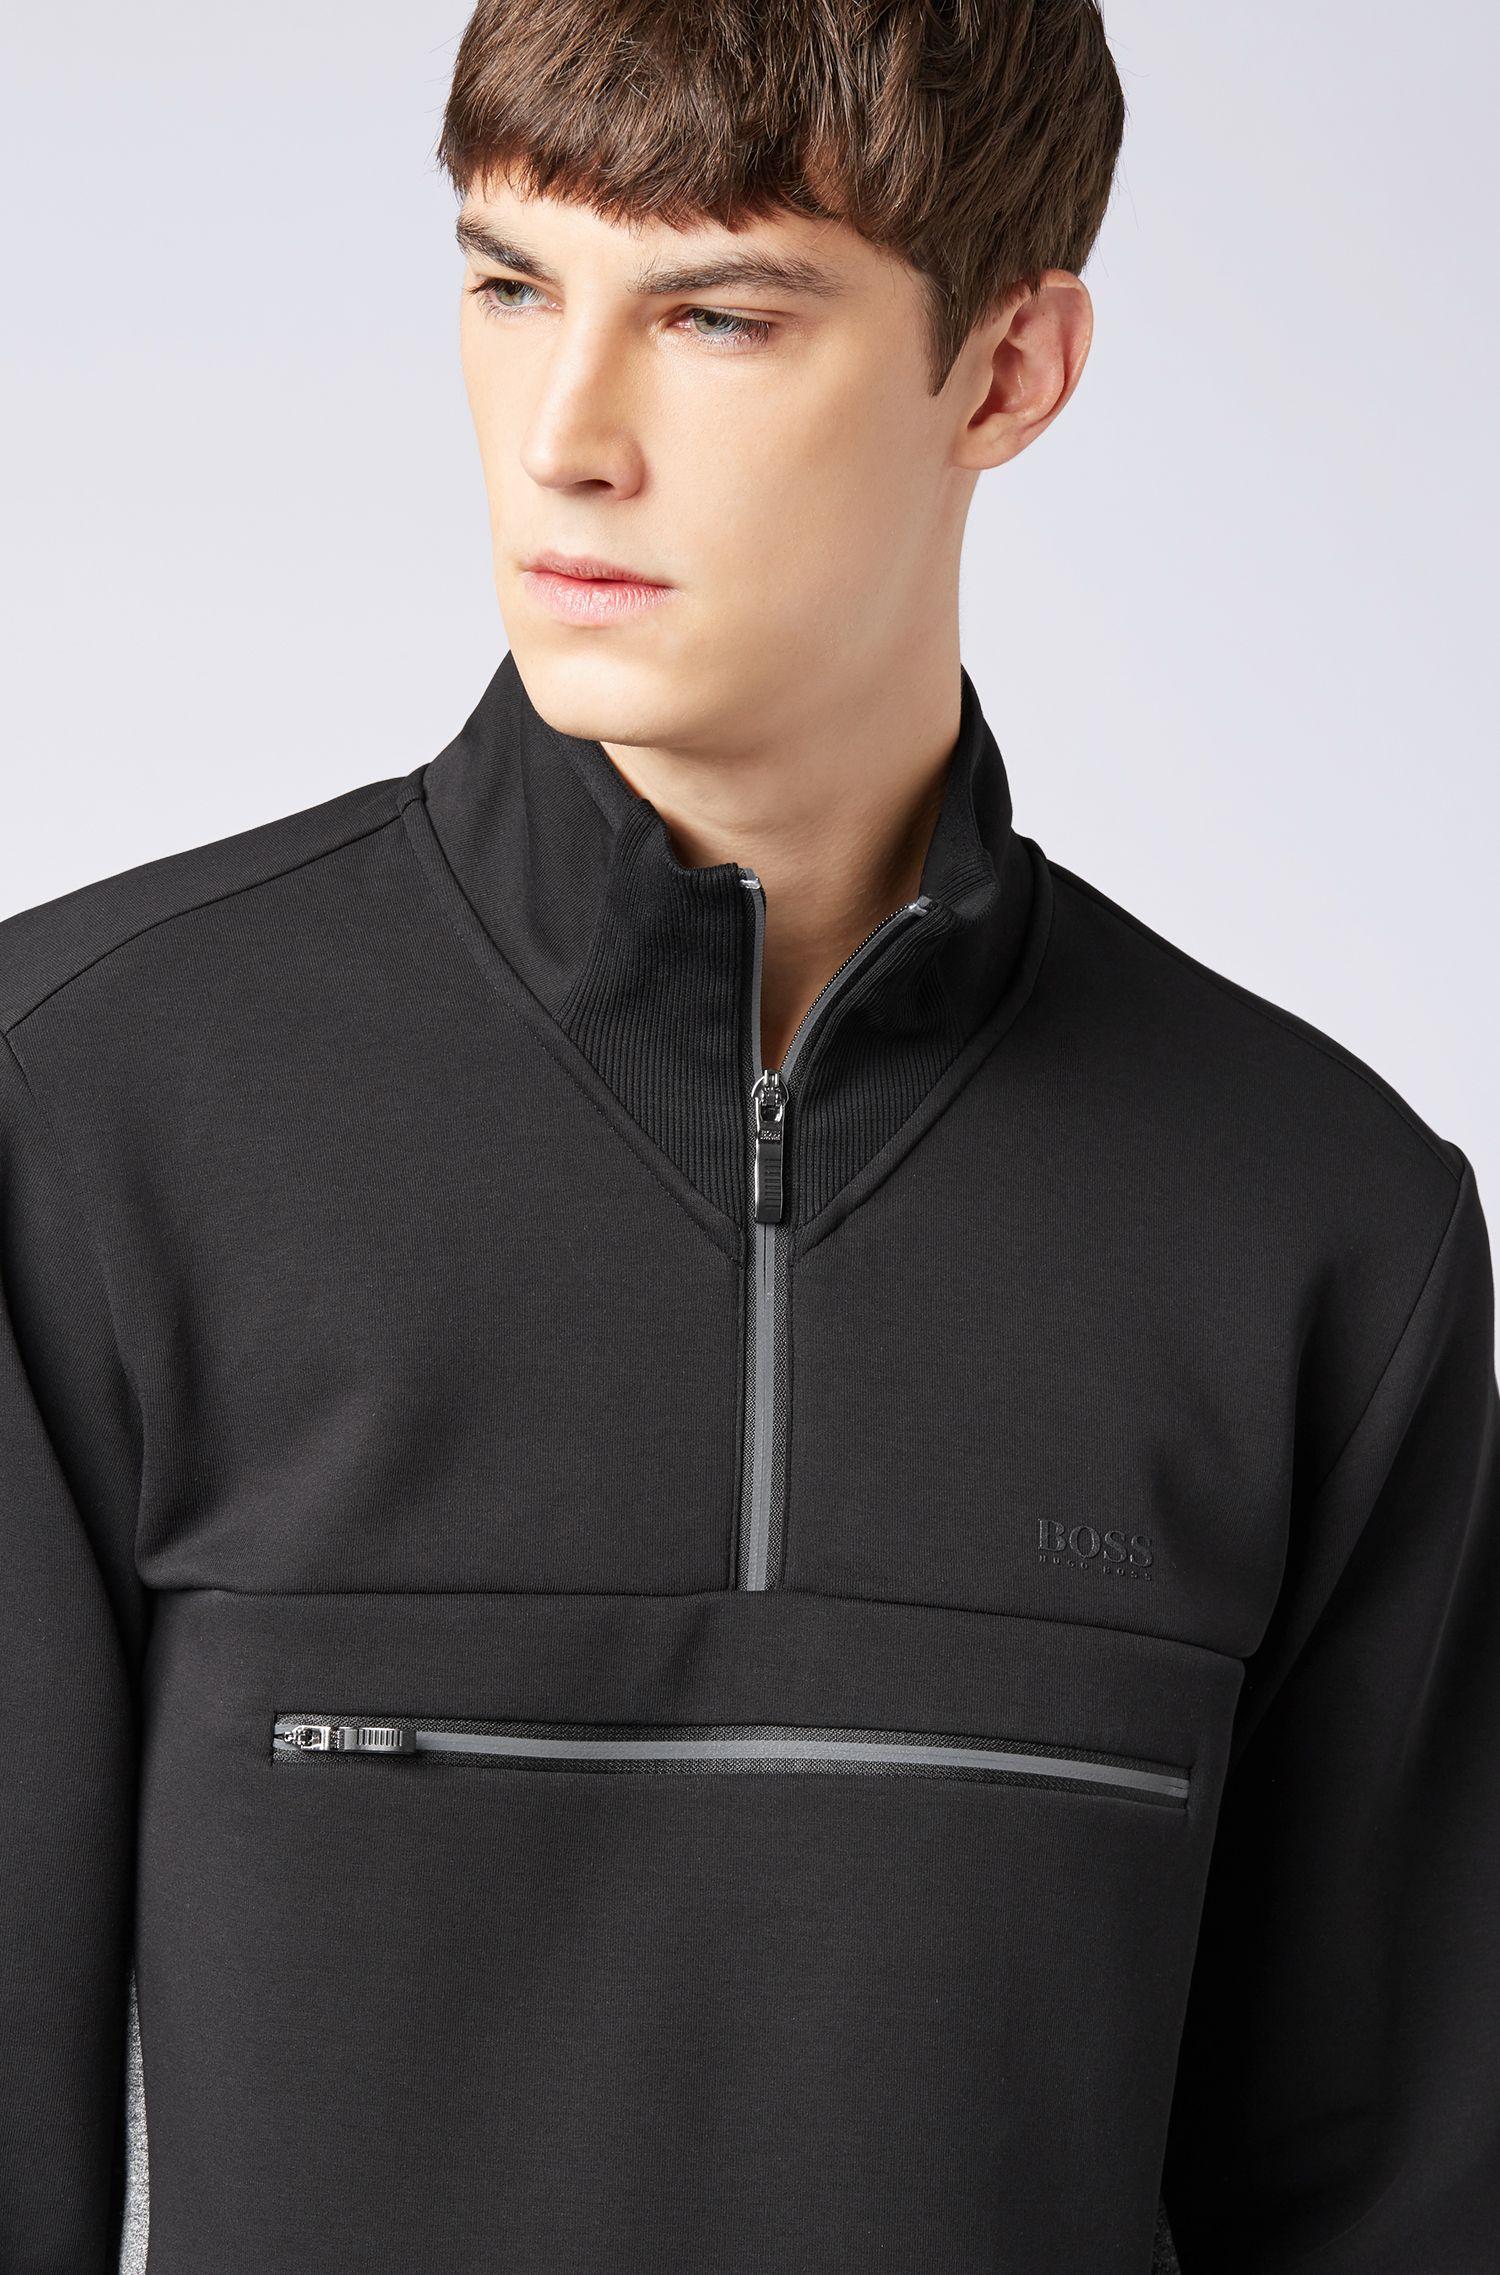 Zip-neck sweatshirt in stretch fabric with reflective details, Black